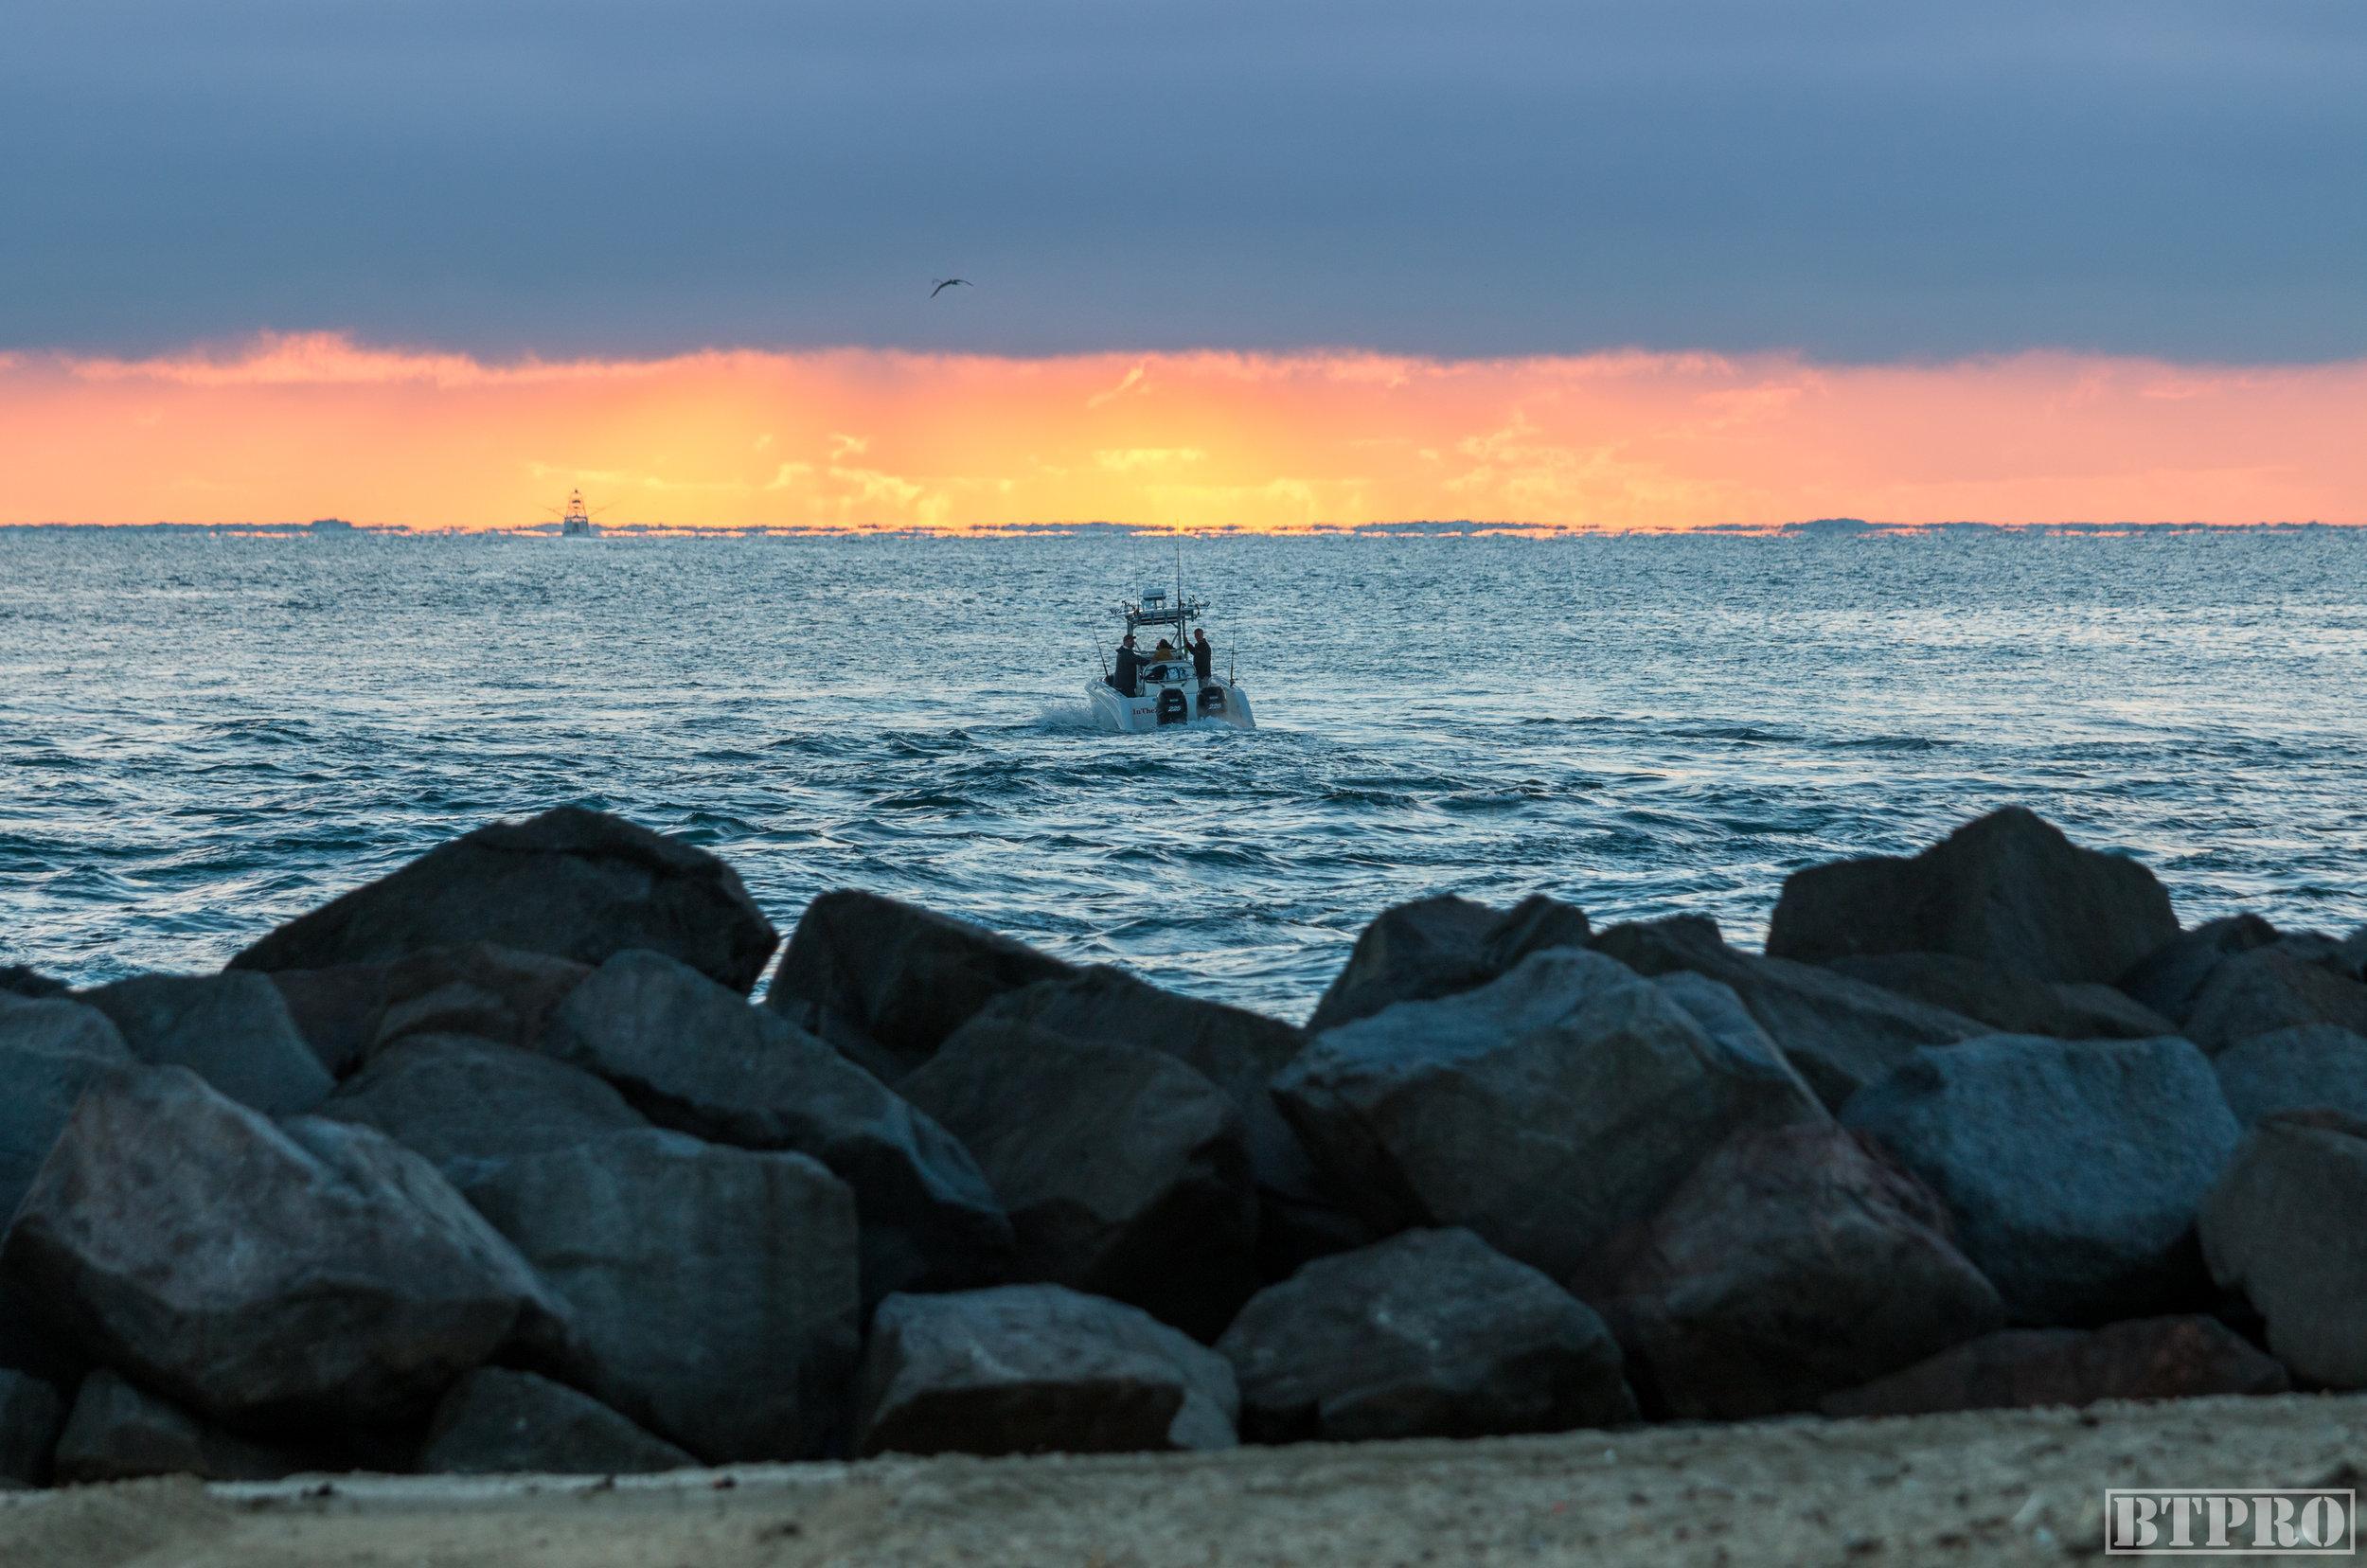 miami, miami beach, sunrise, landscape, landscape photography, sunrise photography